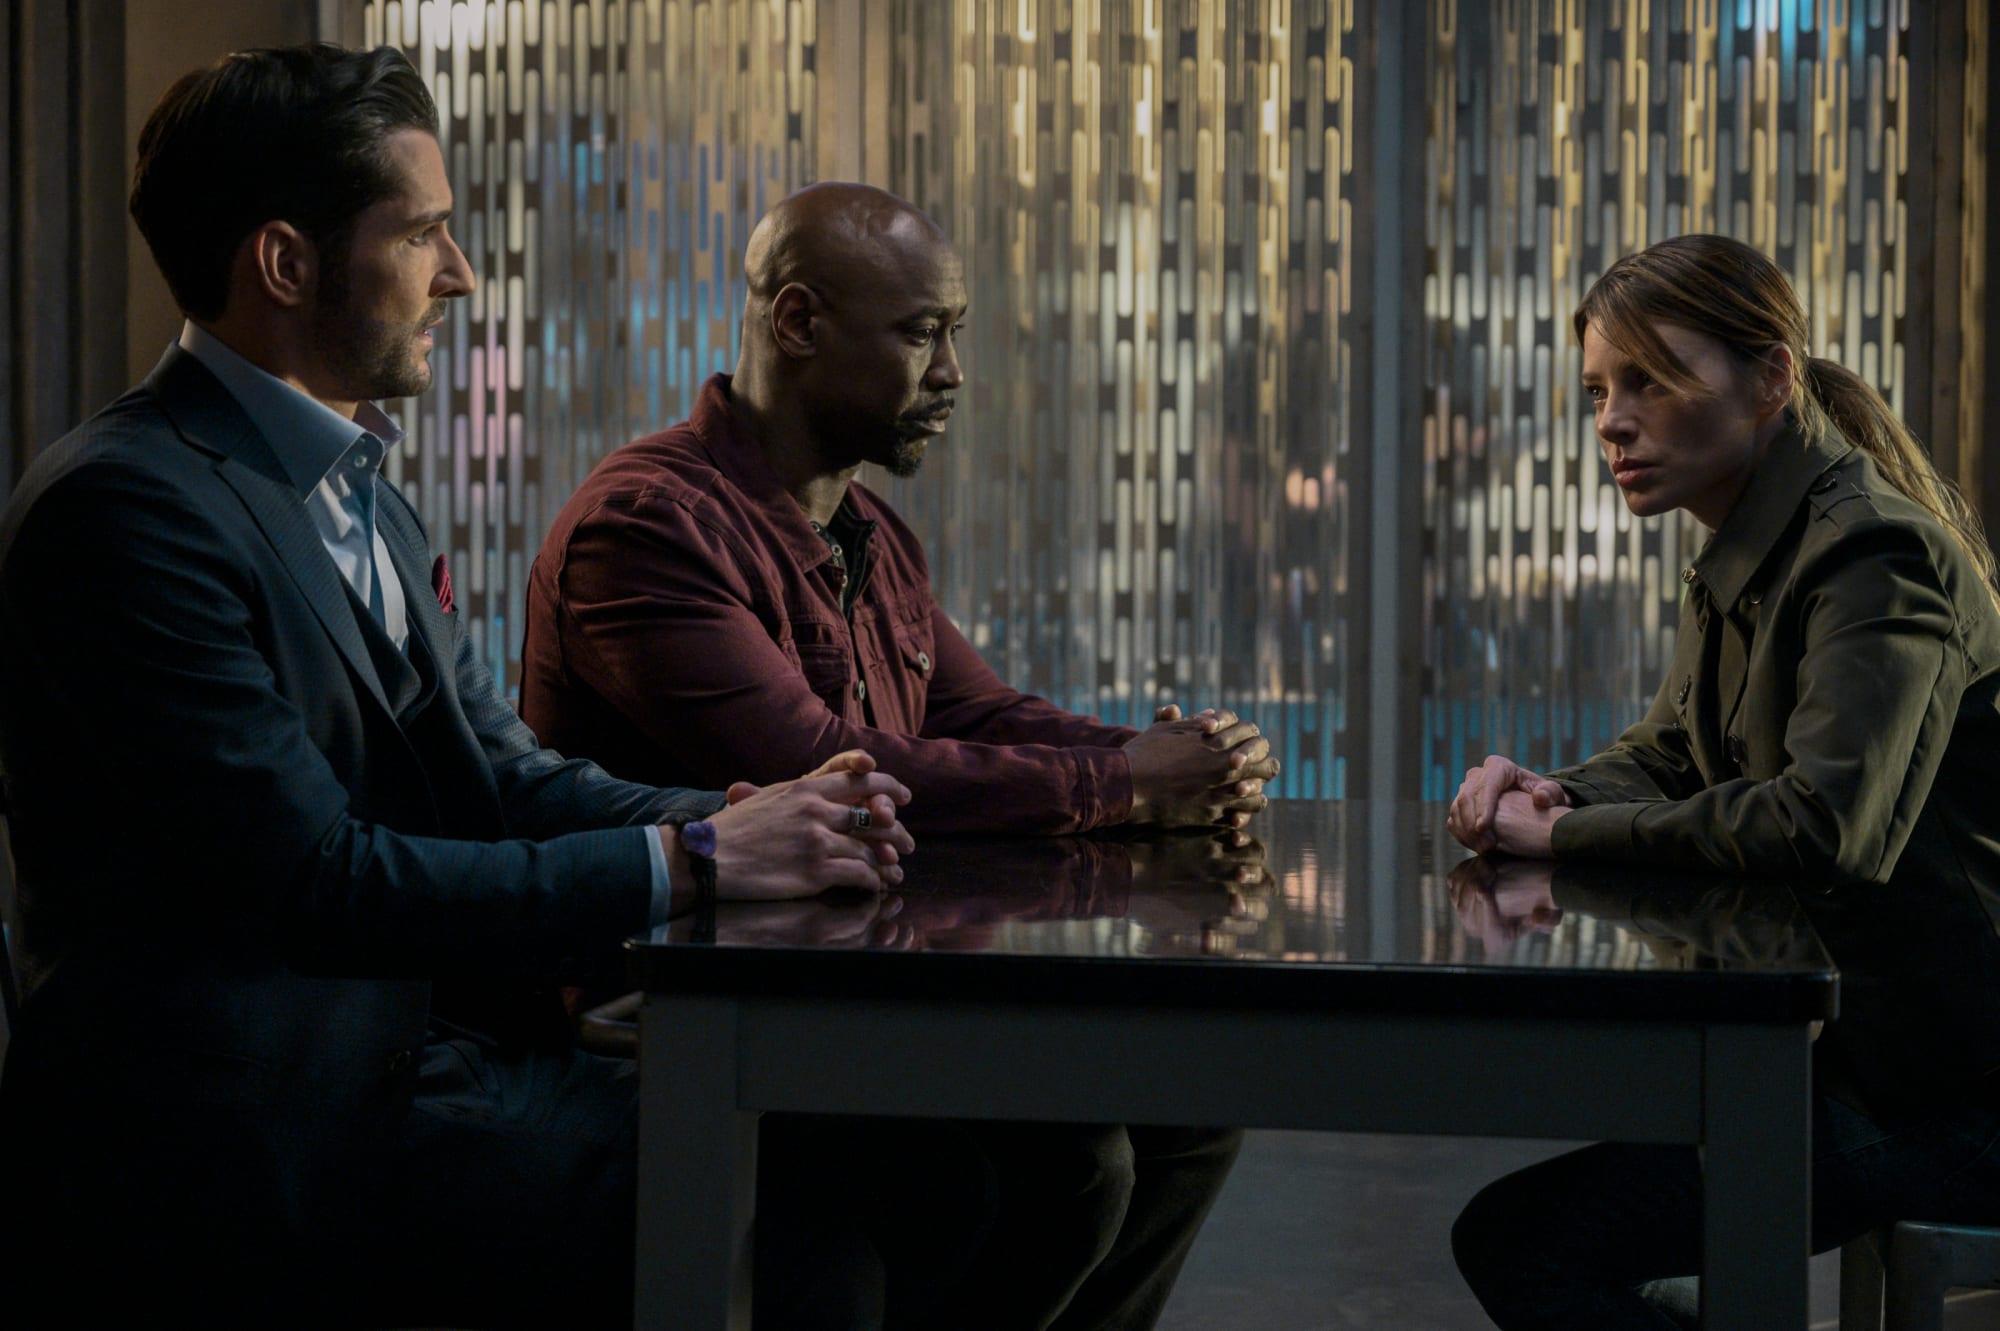 When is Lucifer season 6 (the final season) coming to Netflix?